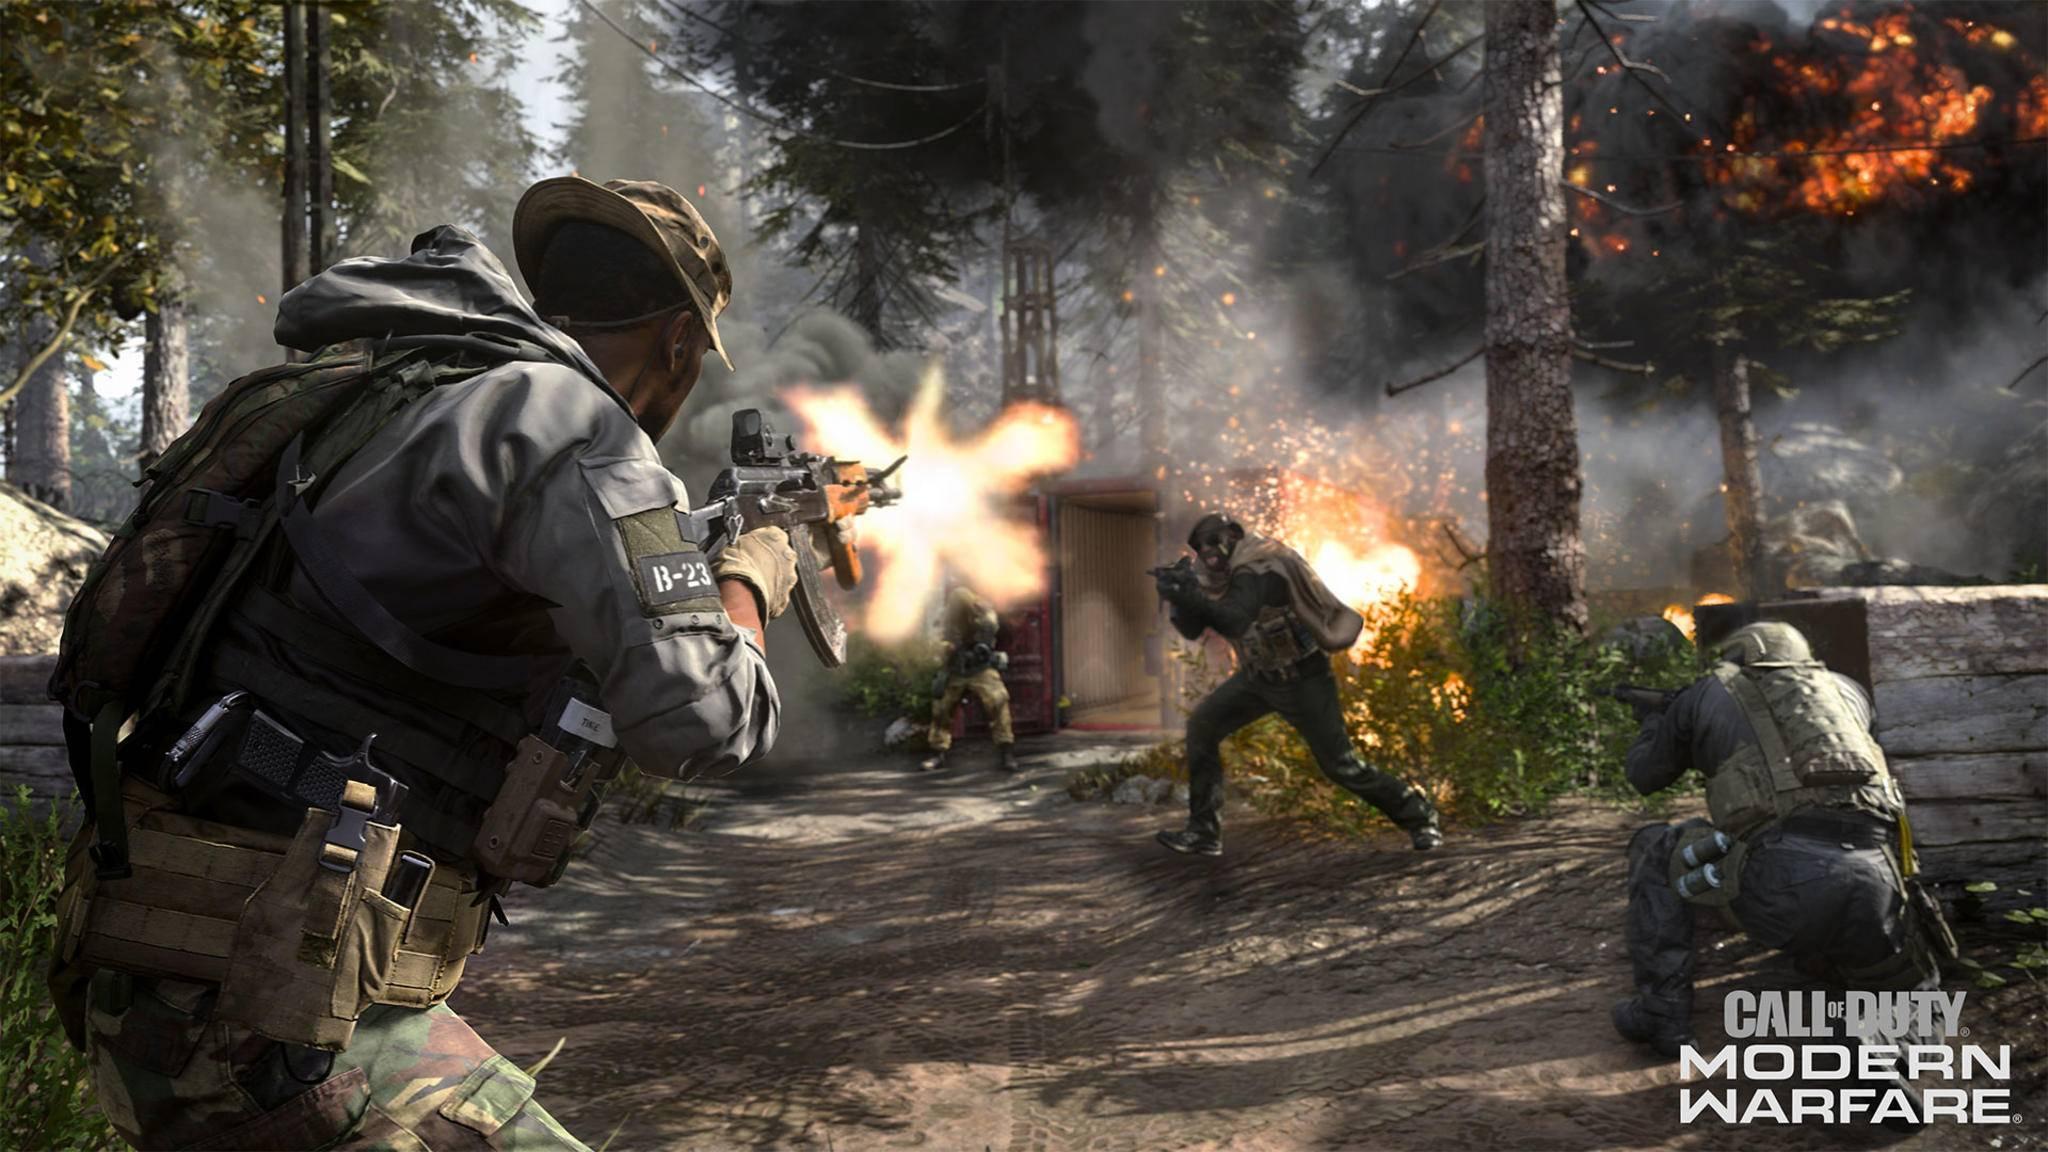 call-of-duty-modern-warfare-multiplayer-screenshot-05